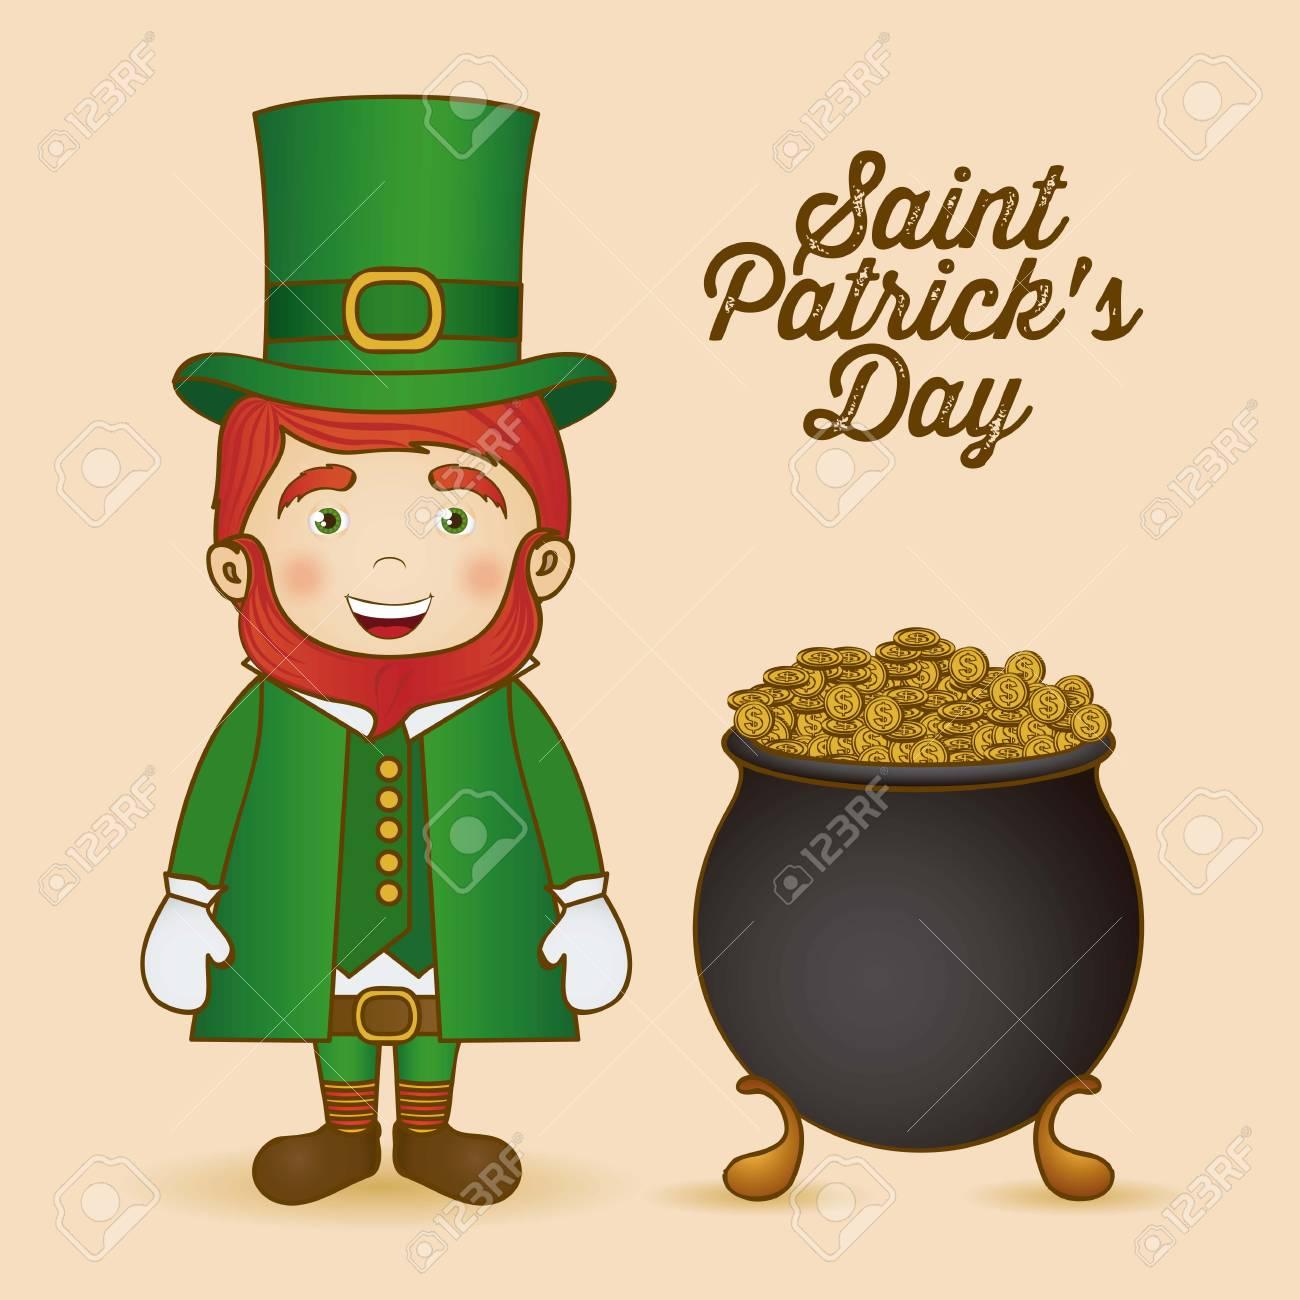 illustration of Saint Patrick's Day, celebration of holiday Stock Vector - 17733975